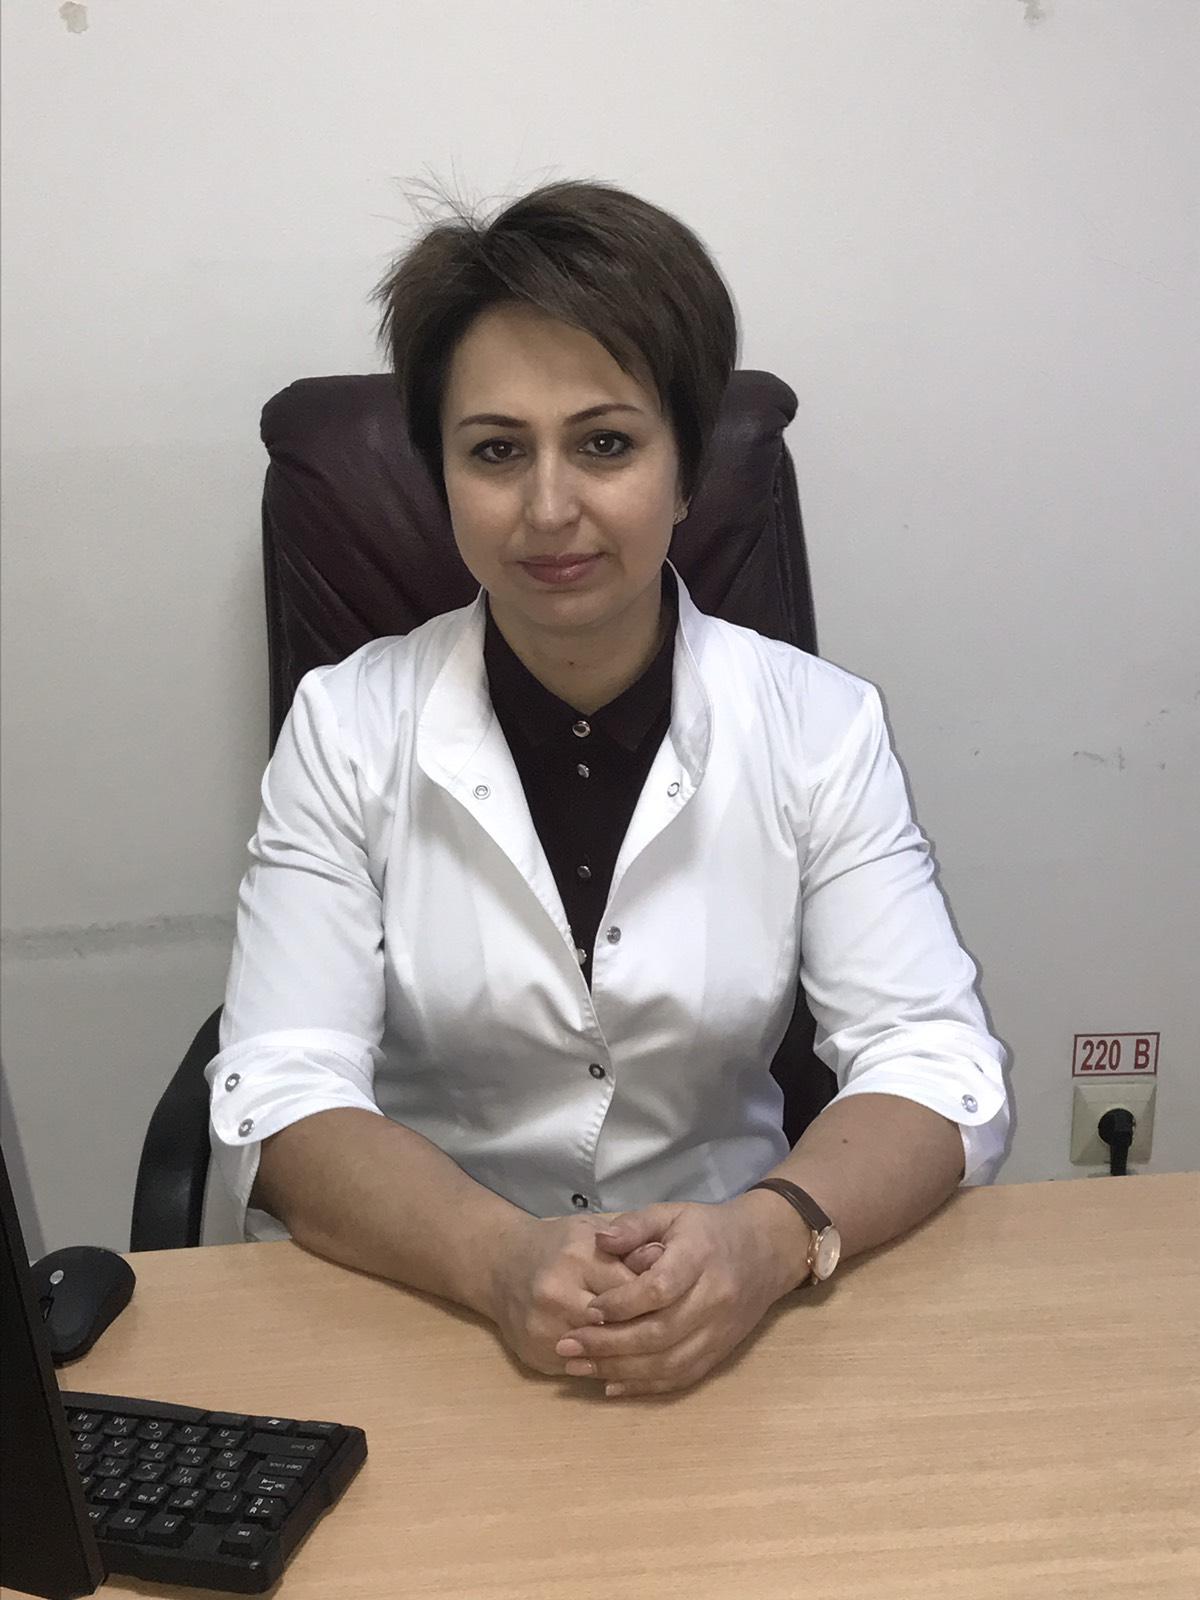 Полтавцева Аниса Владимировна